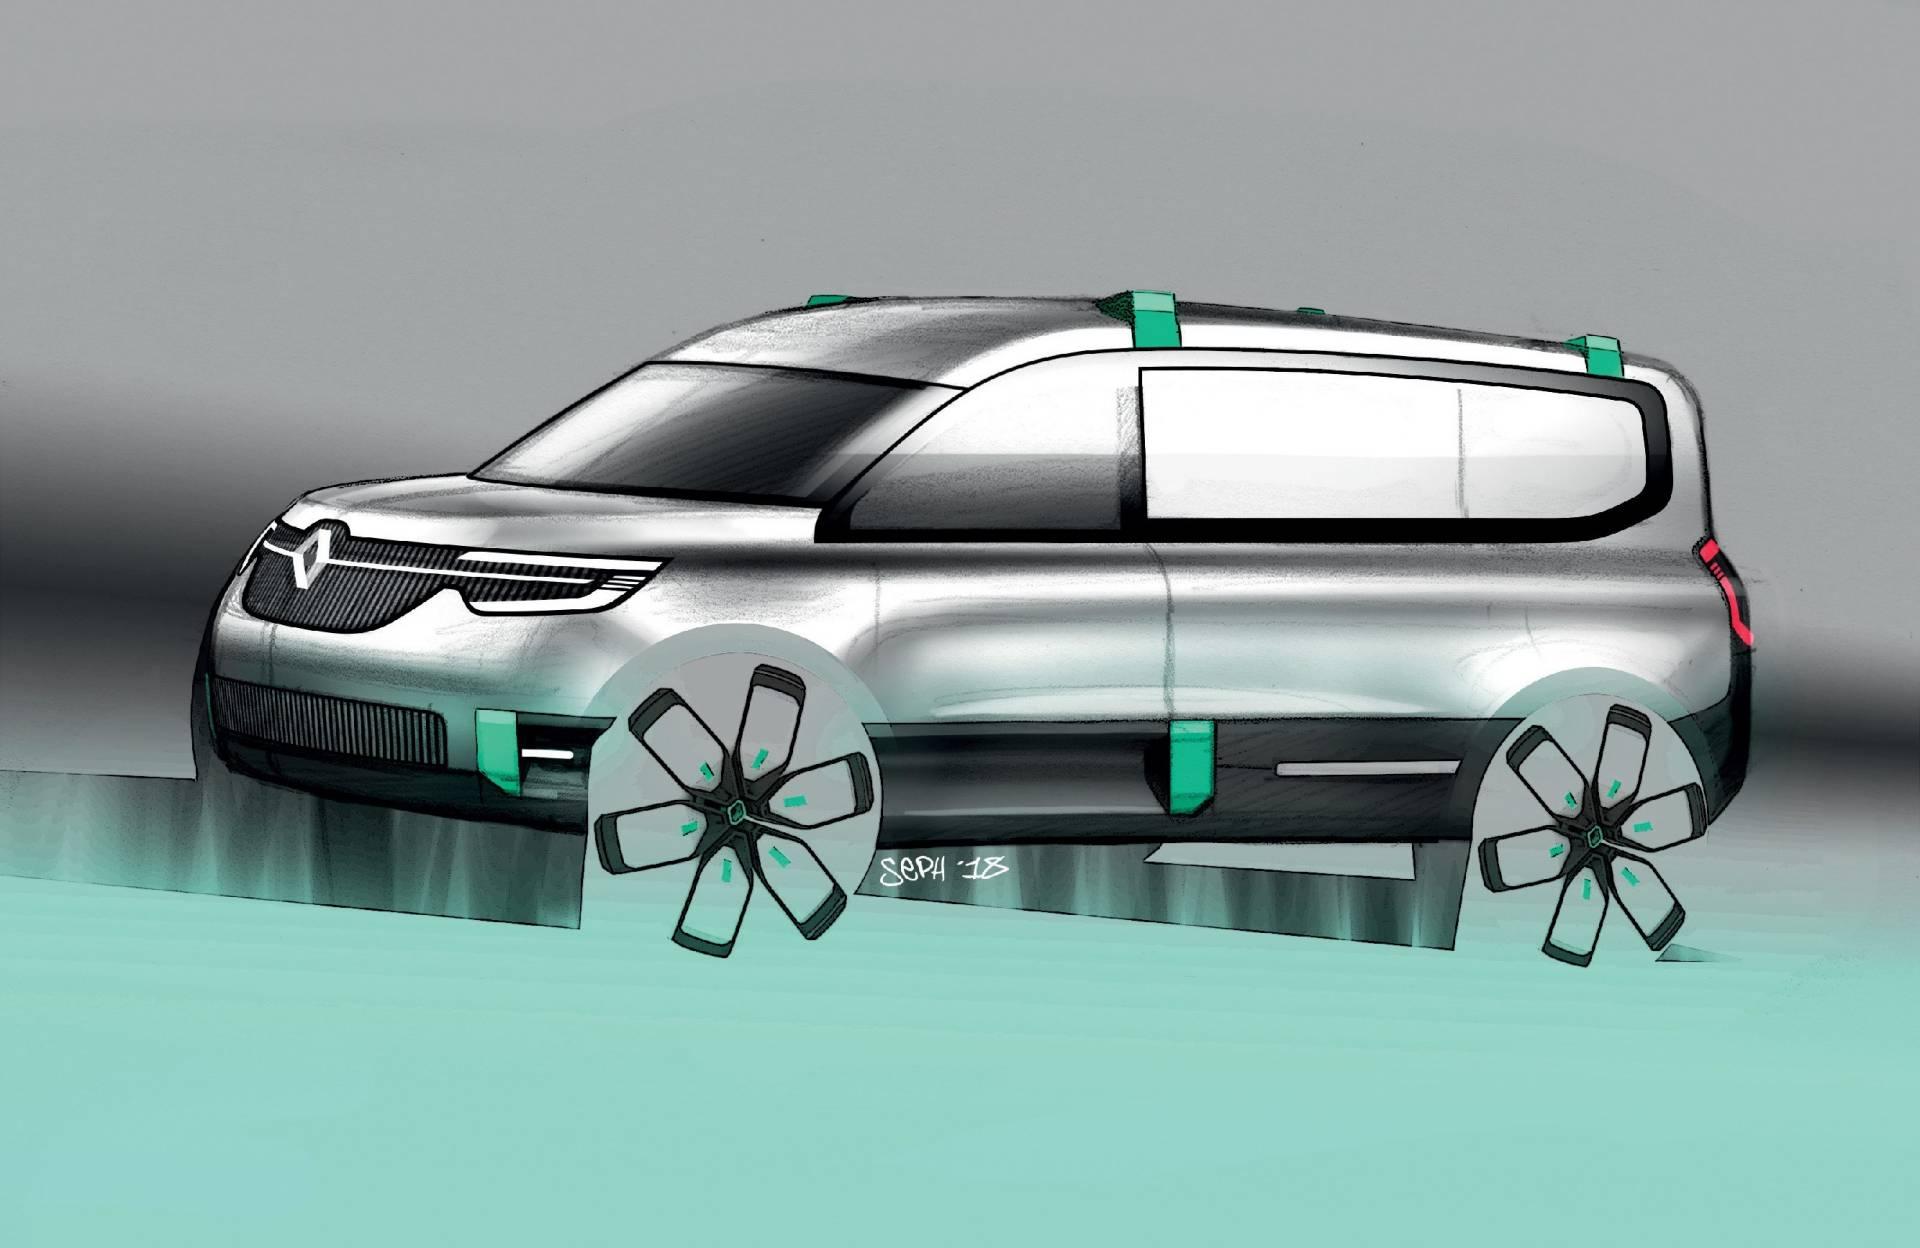 New Renault Kangoo Z E Concept Previews 2020 Production